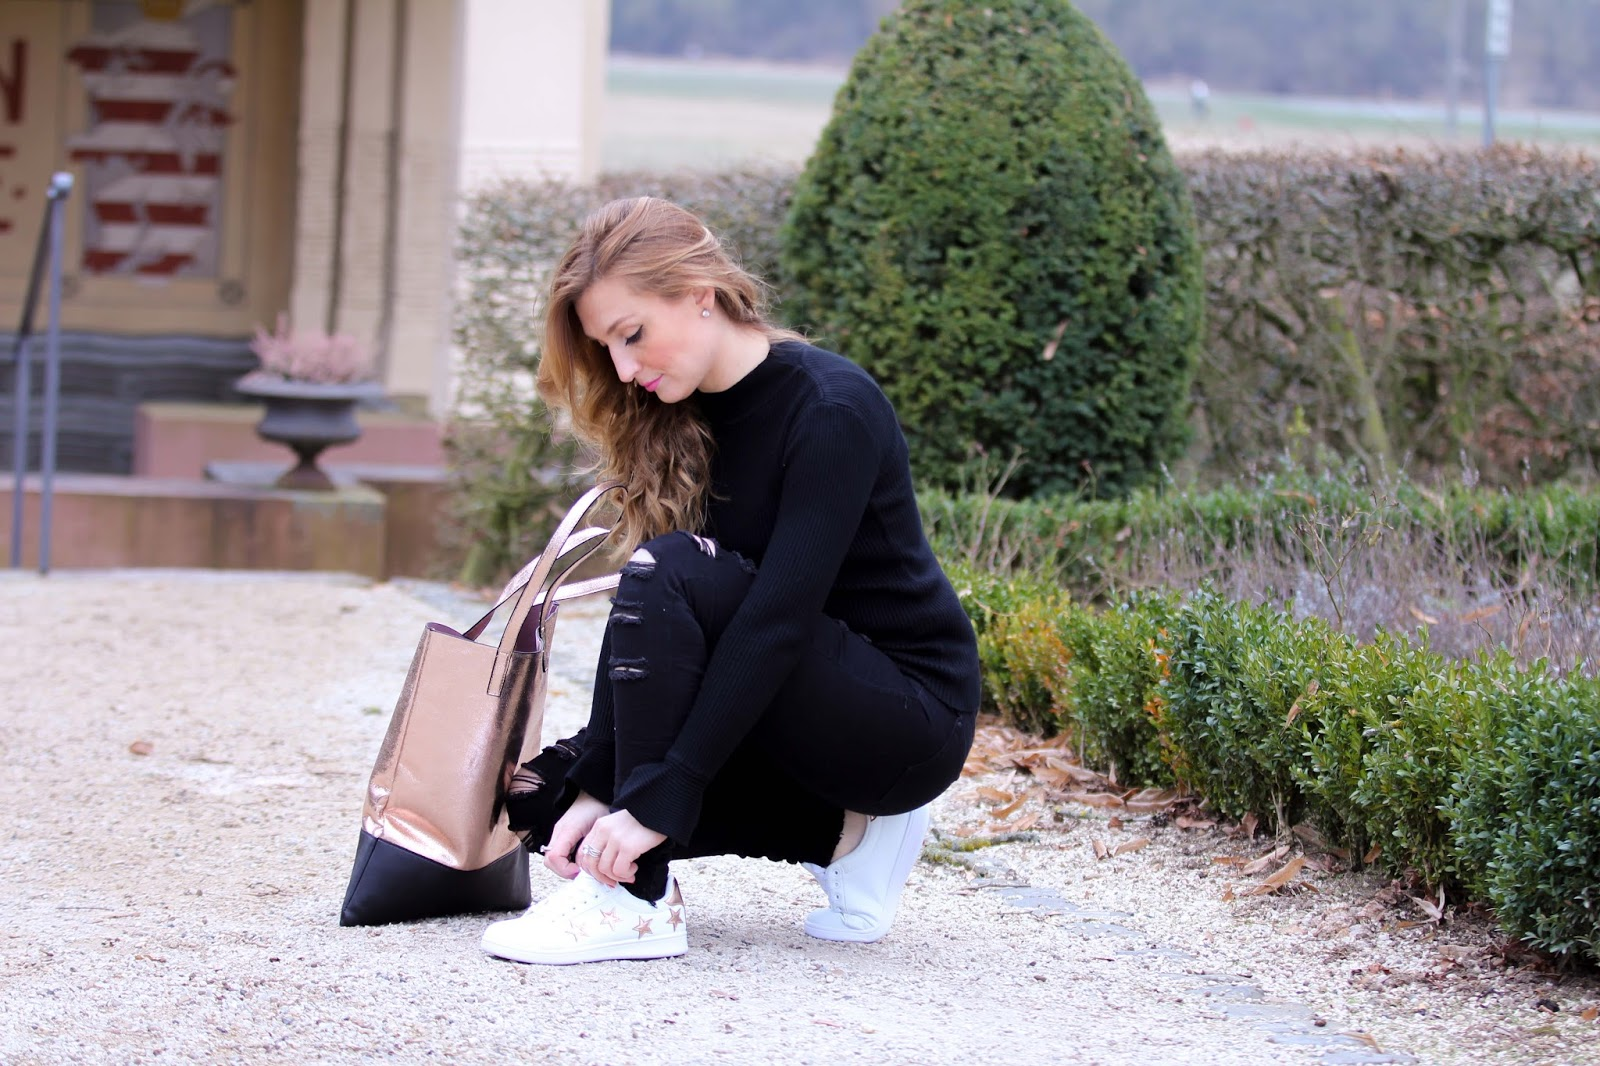 Turnschuhe-fashionblogger-blogger-mit-weißen-Turnschuhen-casual-streetstyle